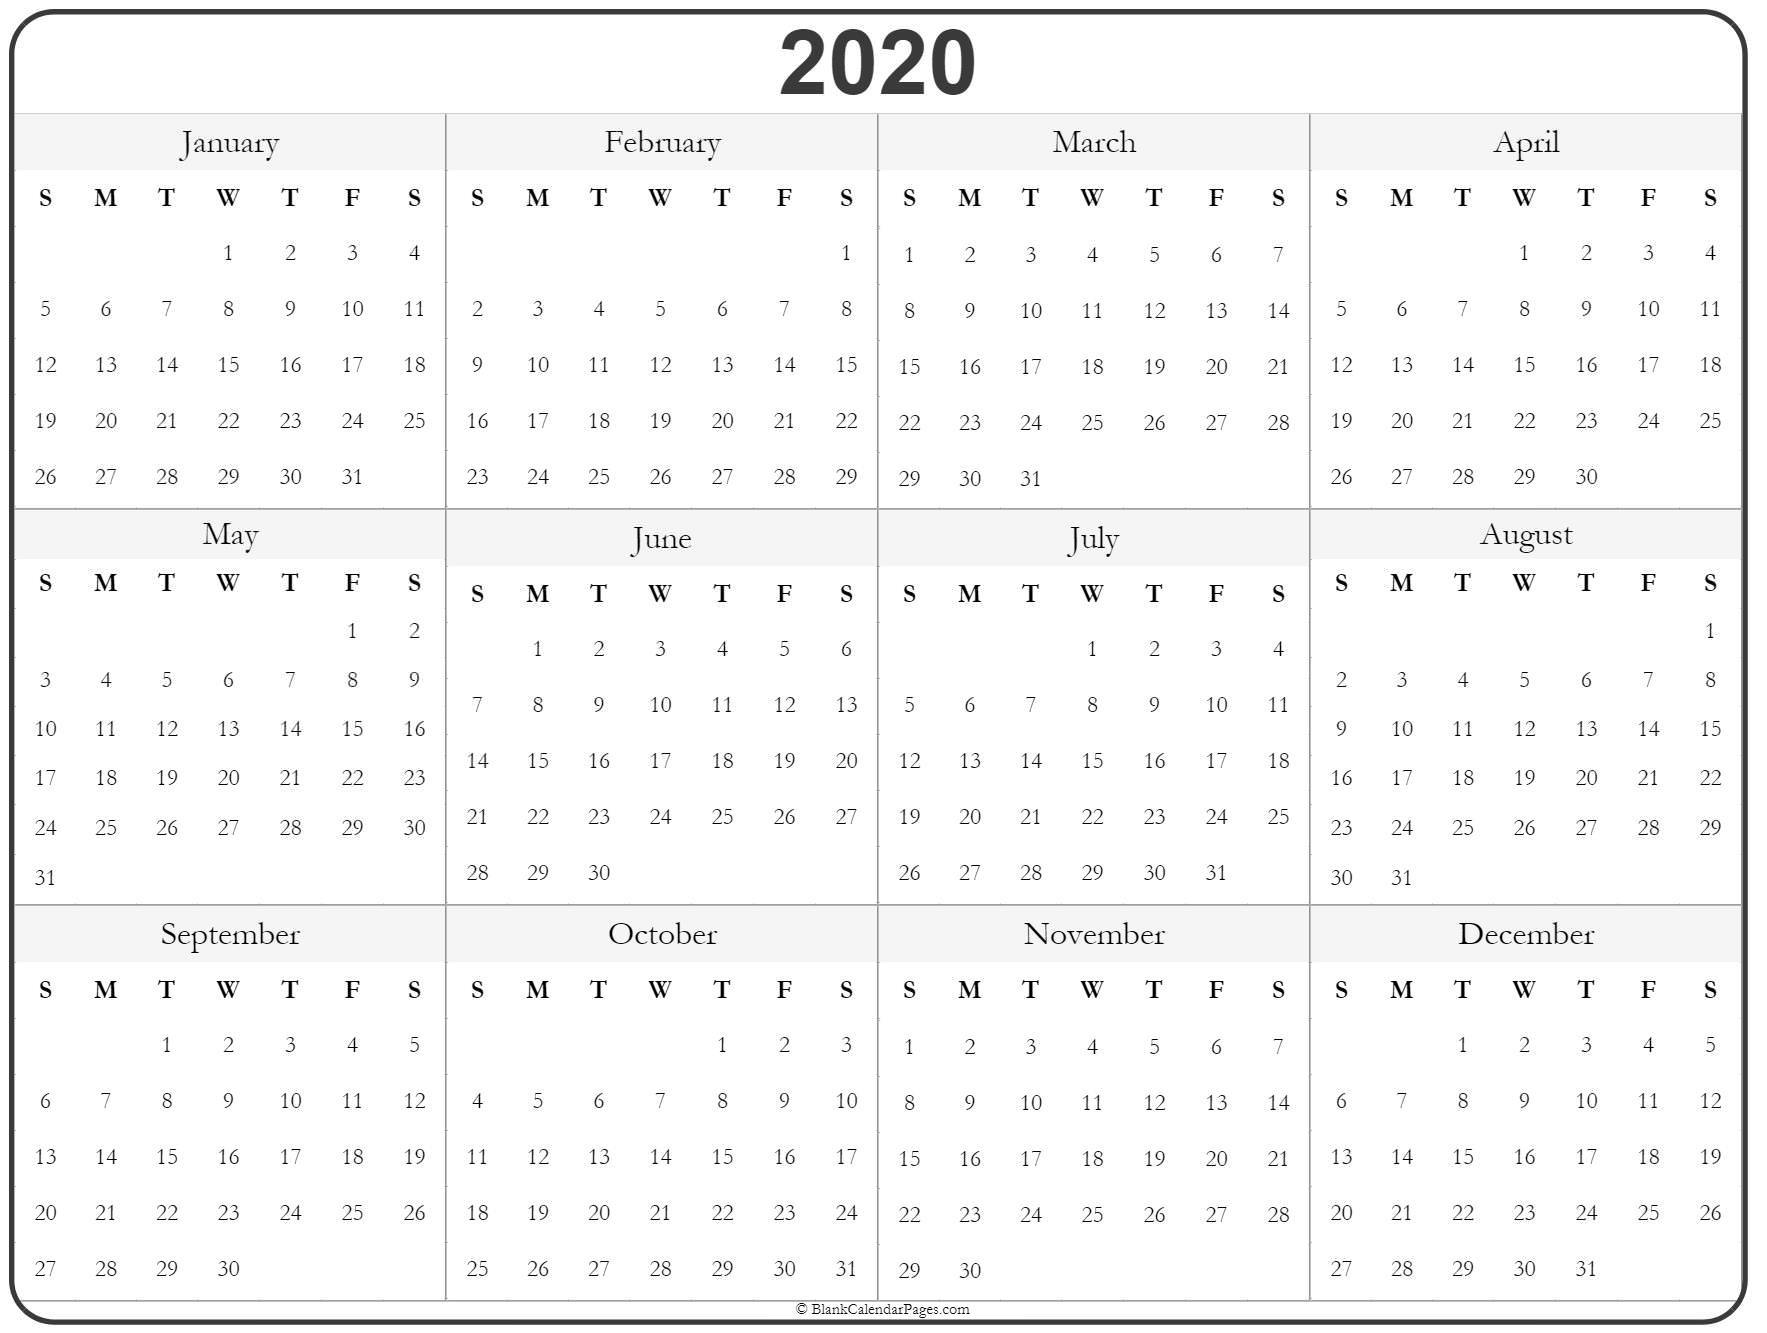 2020 Year Calendar | Yearly Printable  2020 Calendar Year Printable